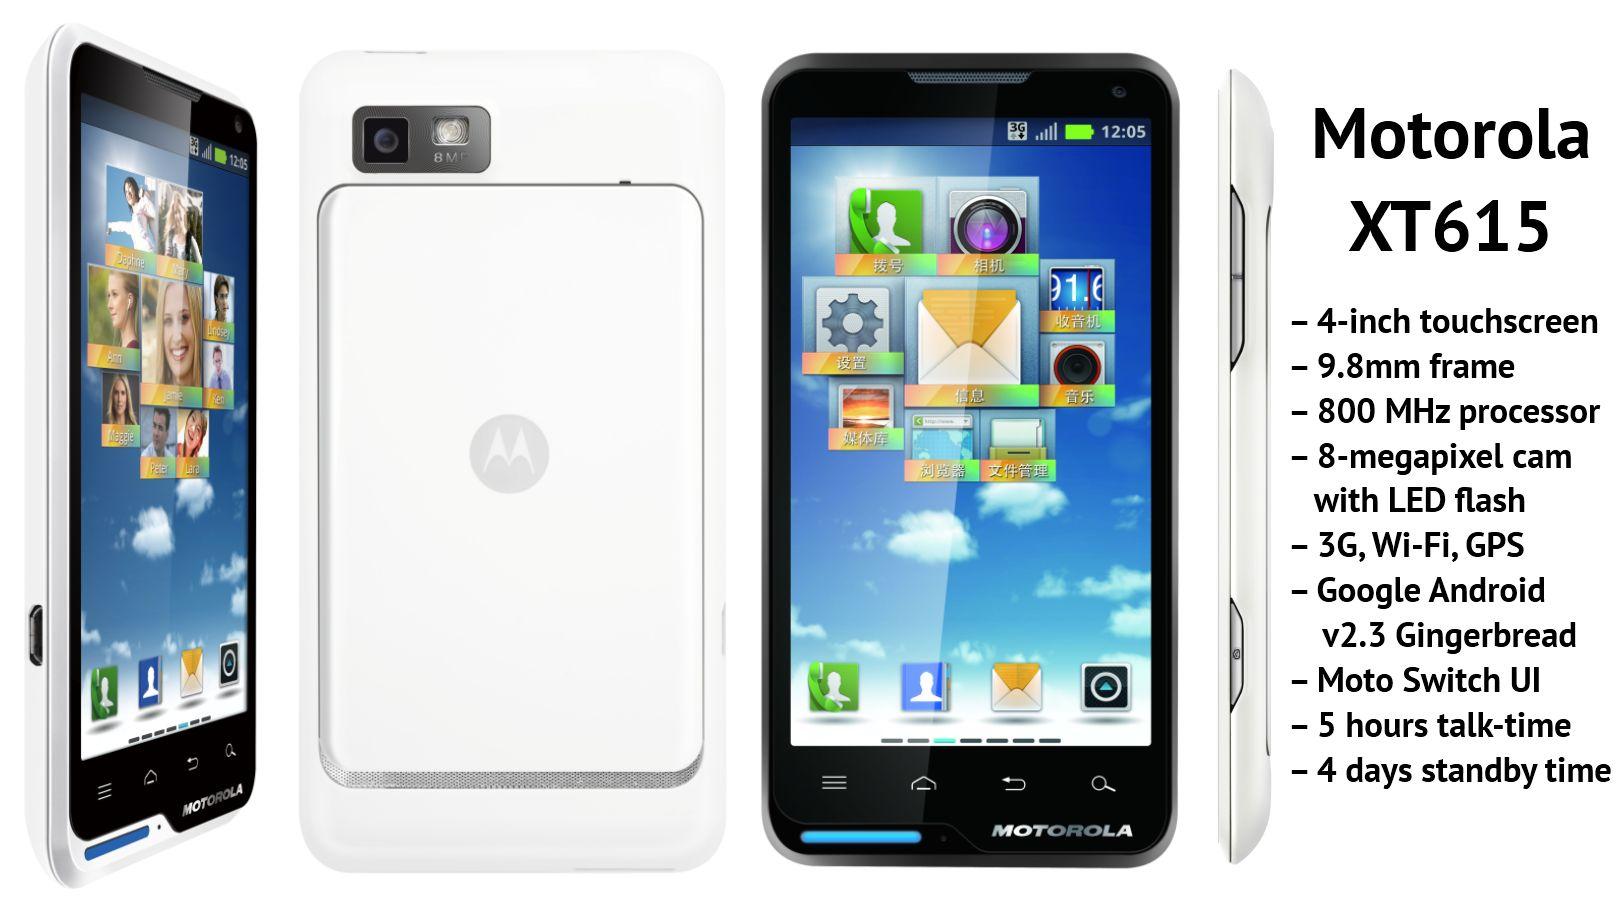 Samsung galaxy tab 2 10 1 specs - Motorola Moto Xt615 Spesifikasi